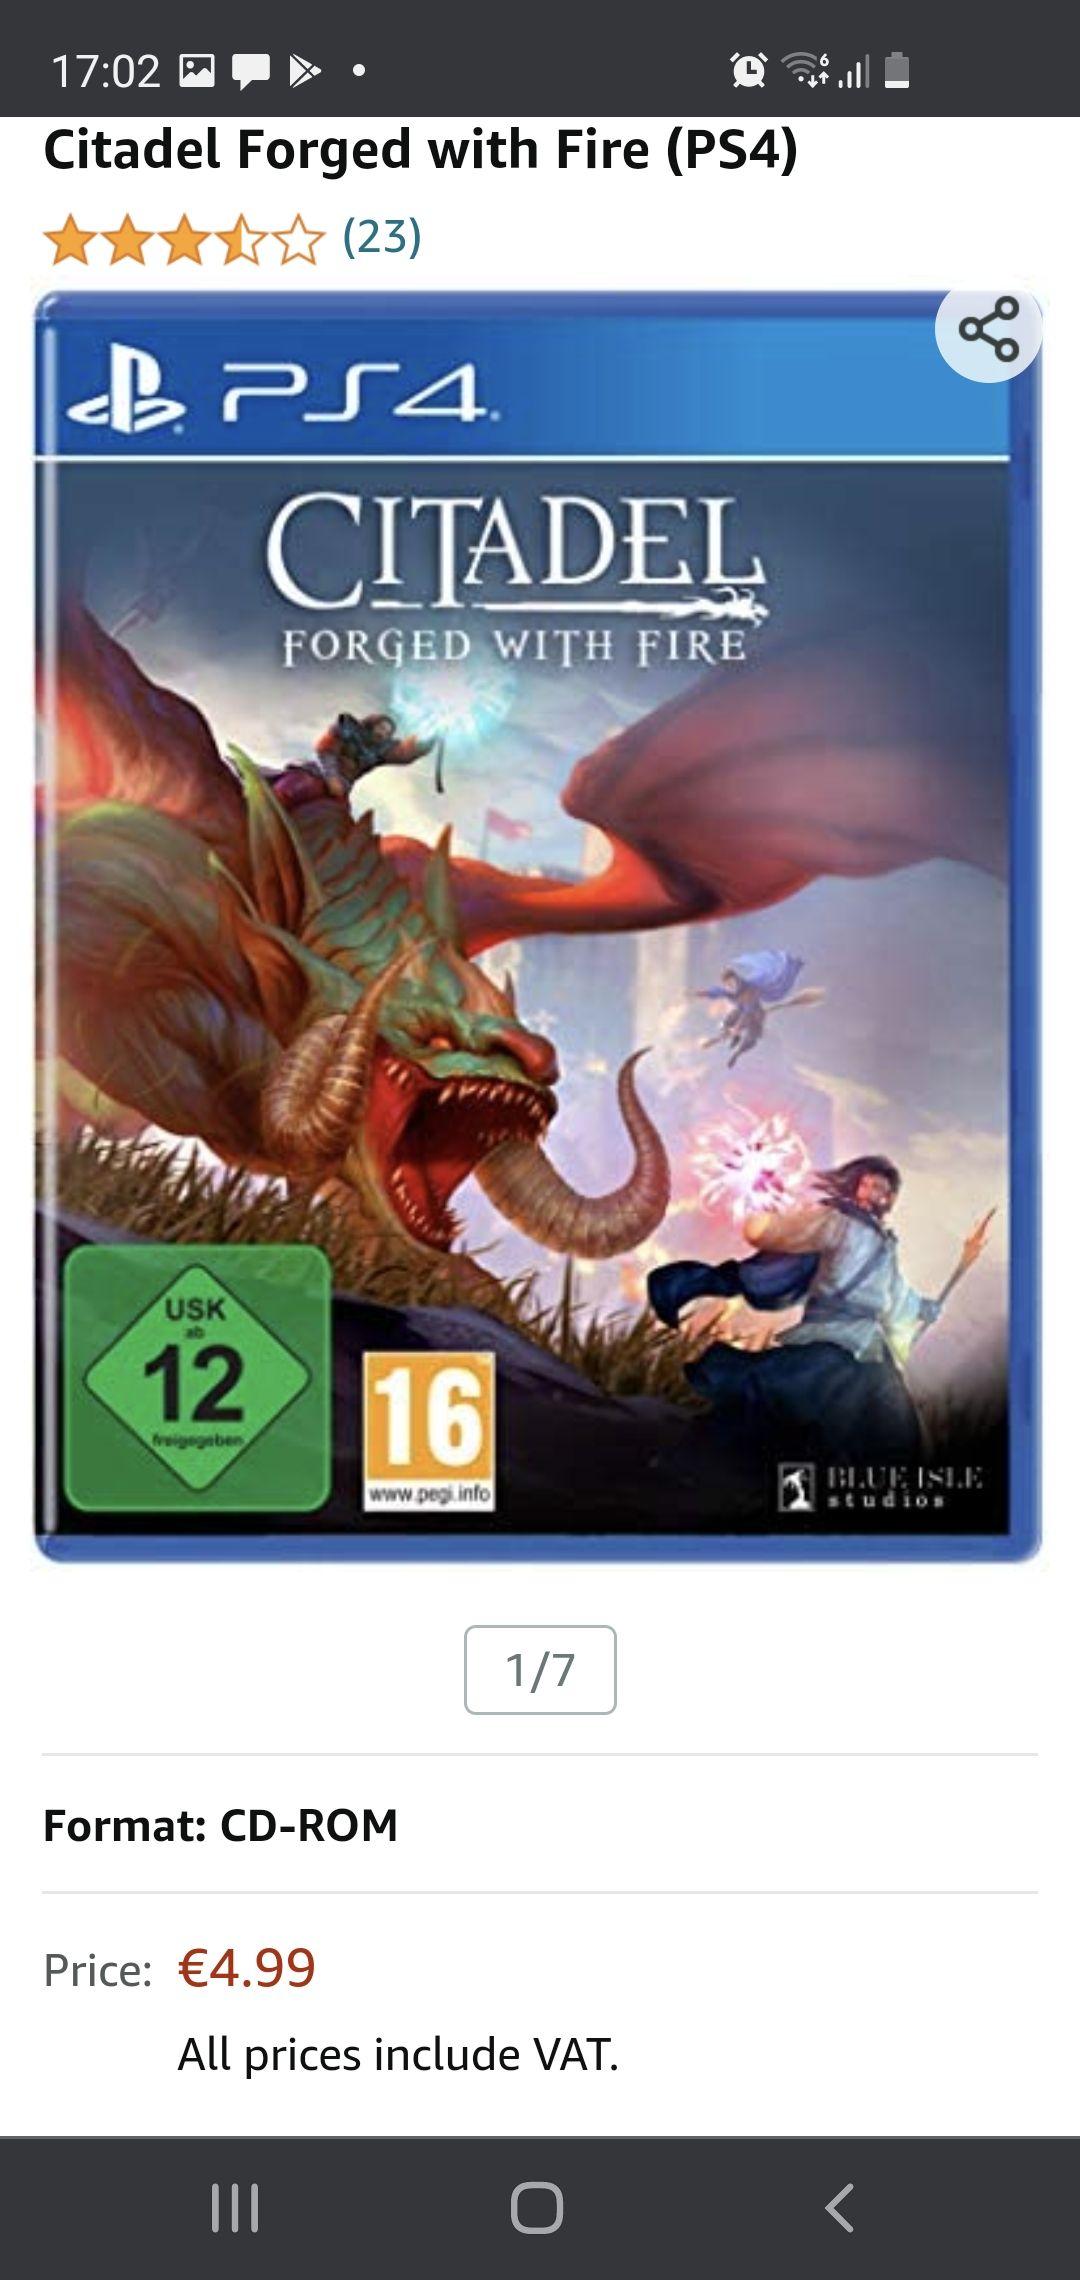 Citadel Forged with Fire (PS4) Inclusief gratis verzending